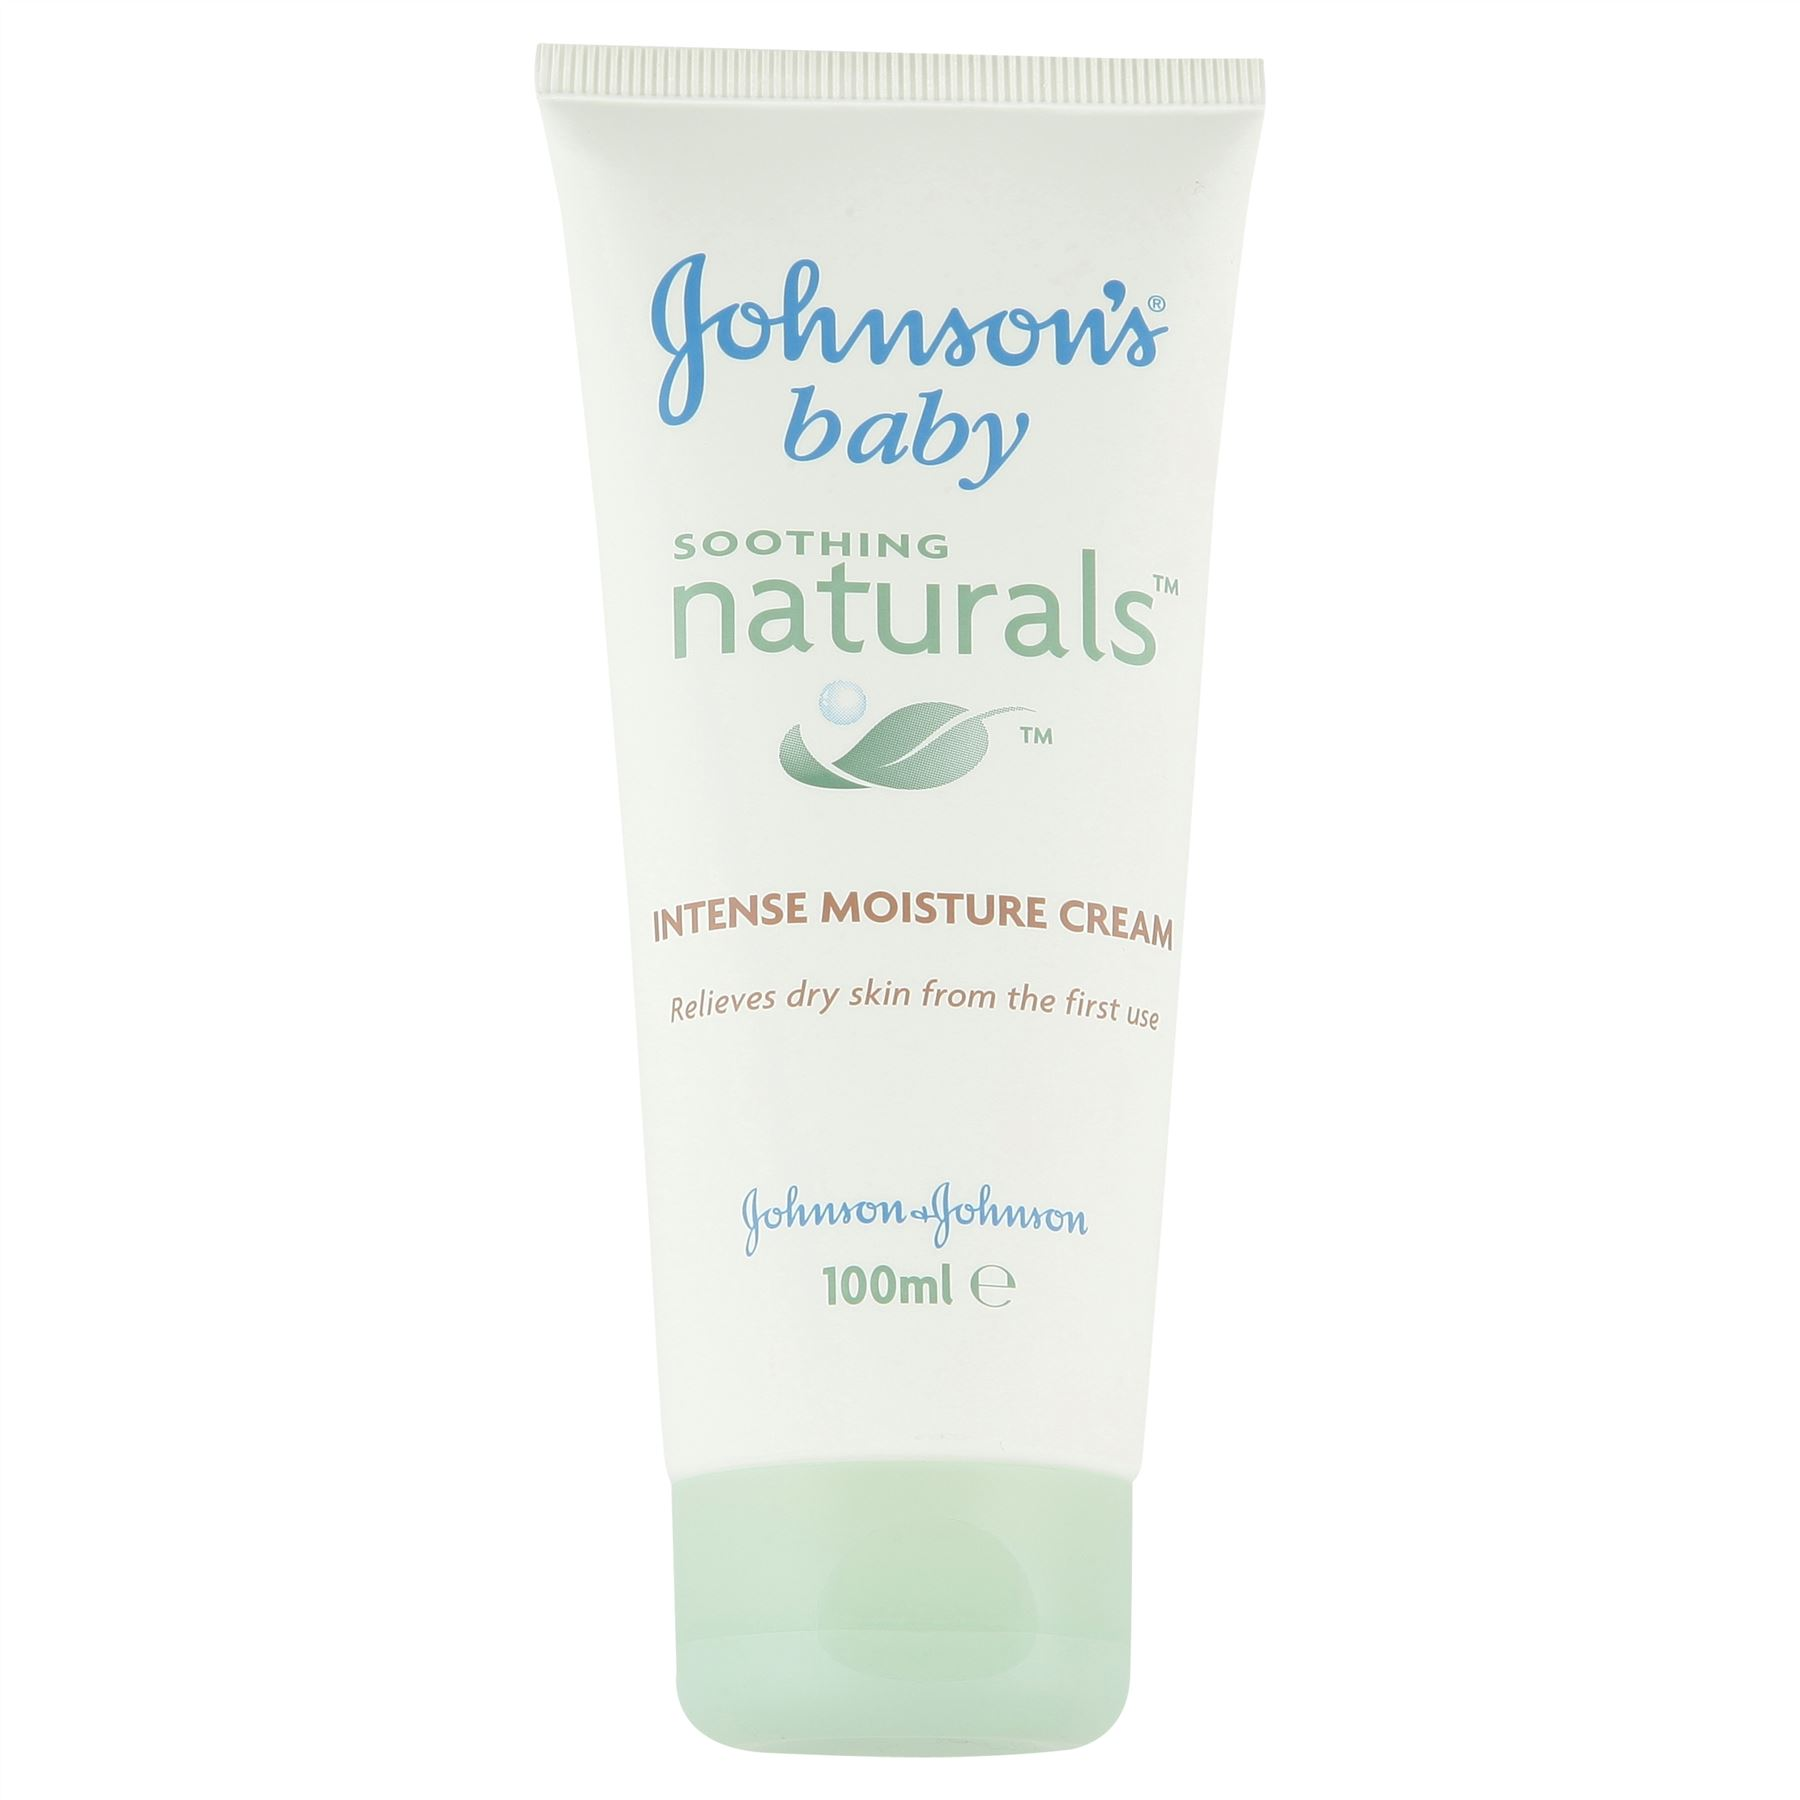 Johnsons Baby Soothing Naturals Intense Moisture Cream 100ml 100gr Image 3